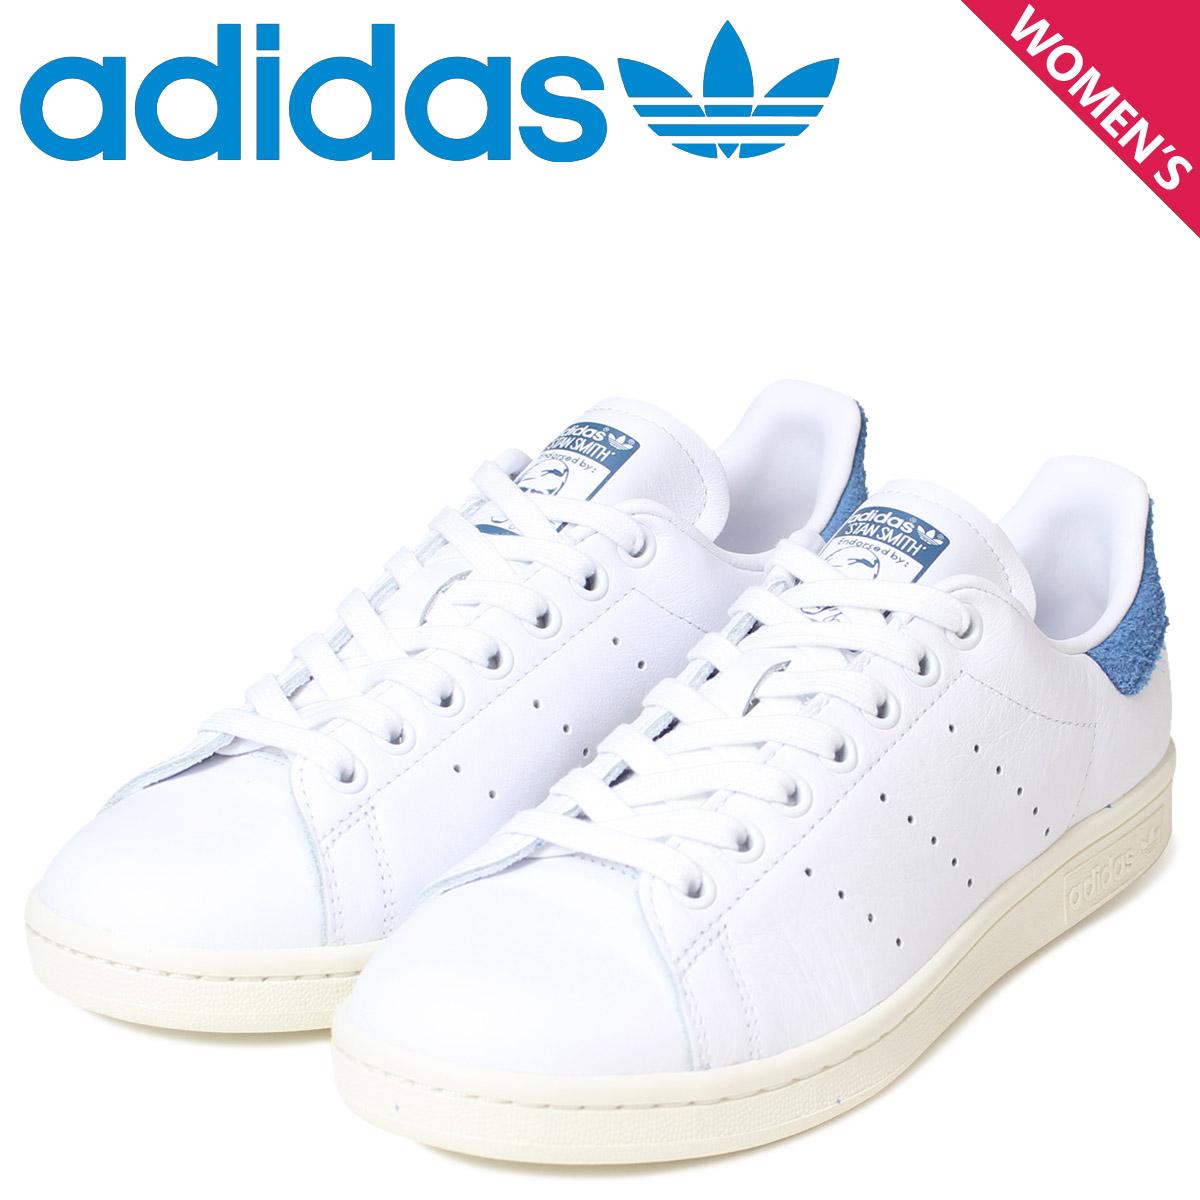 adidas stan smith online kopen